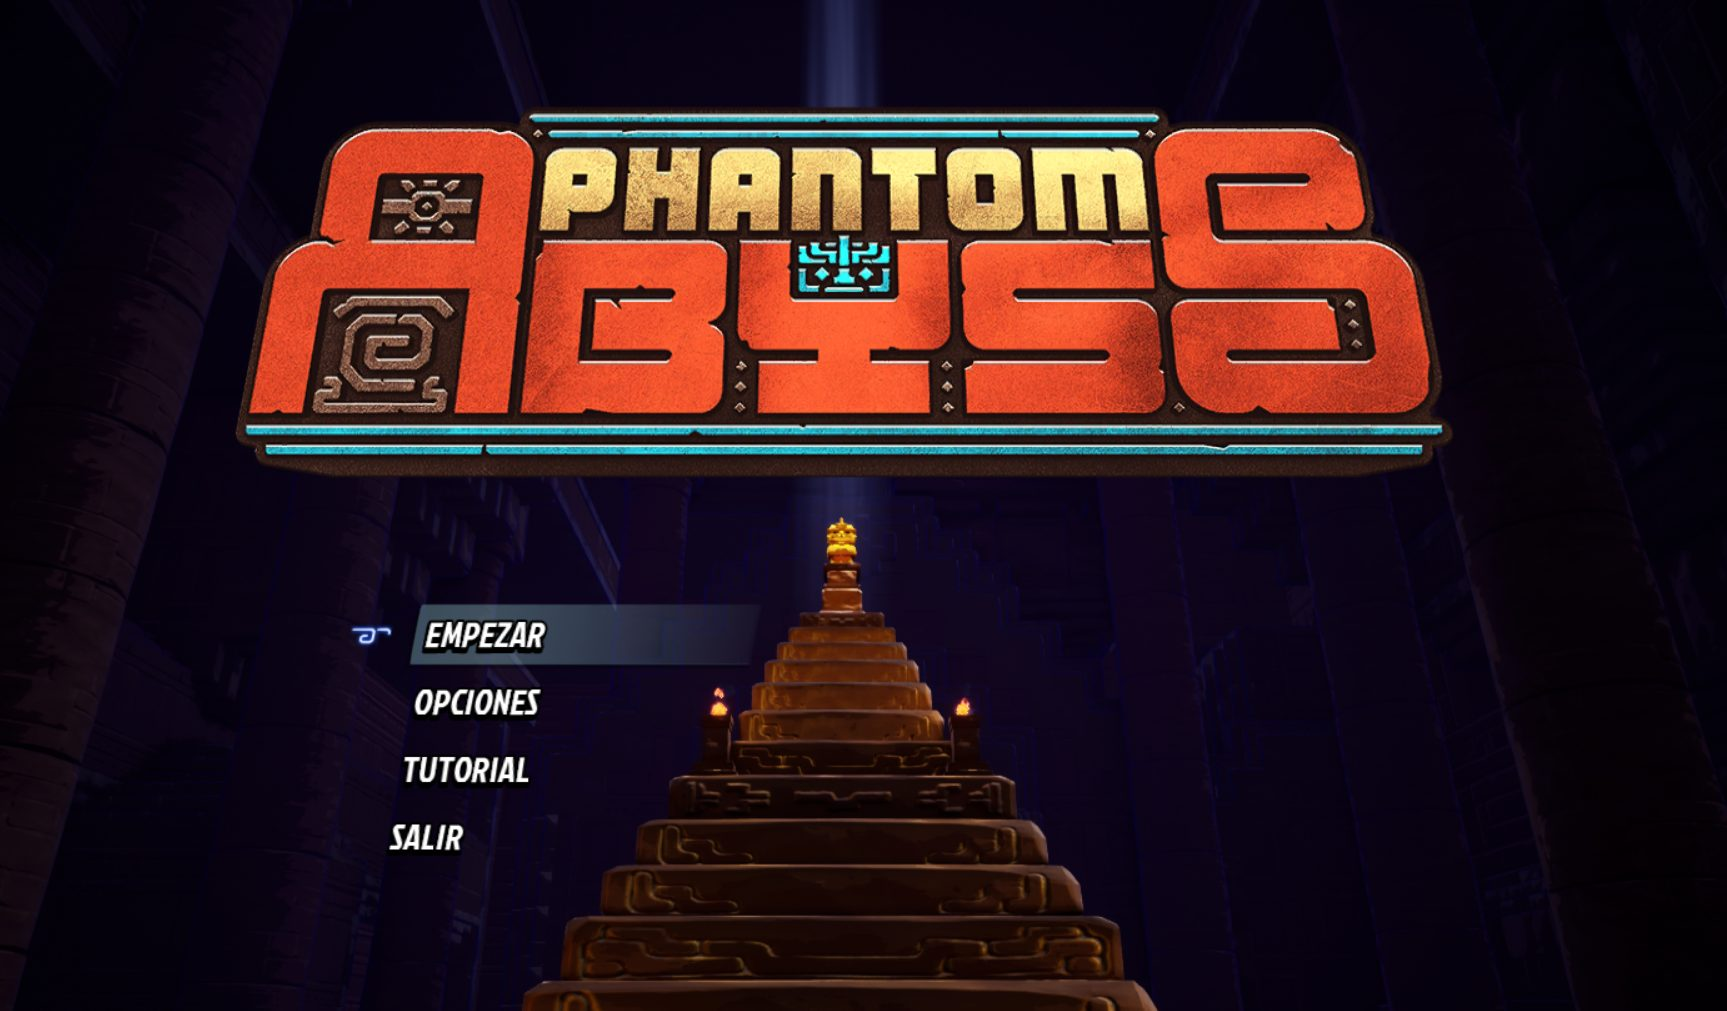 Foto de Phantom Abyss, no pierdas la calma!